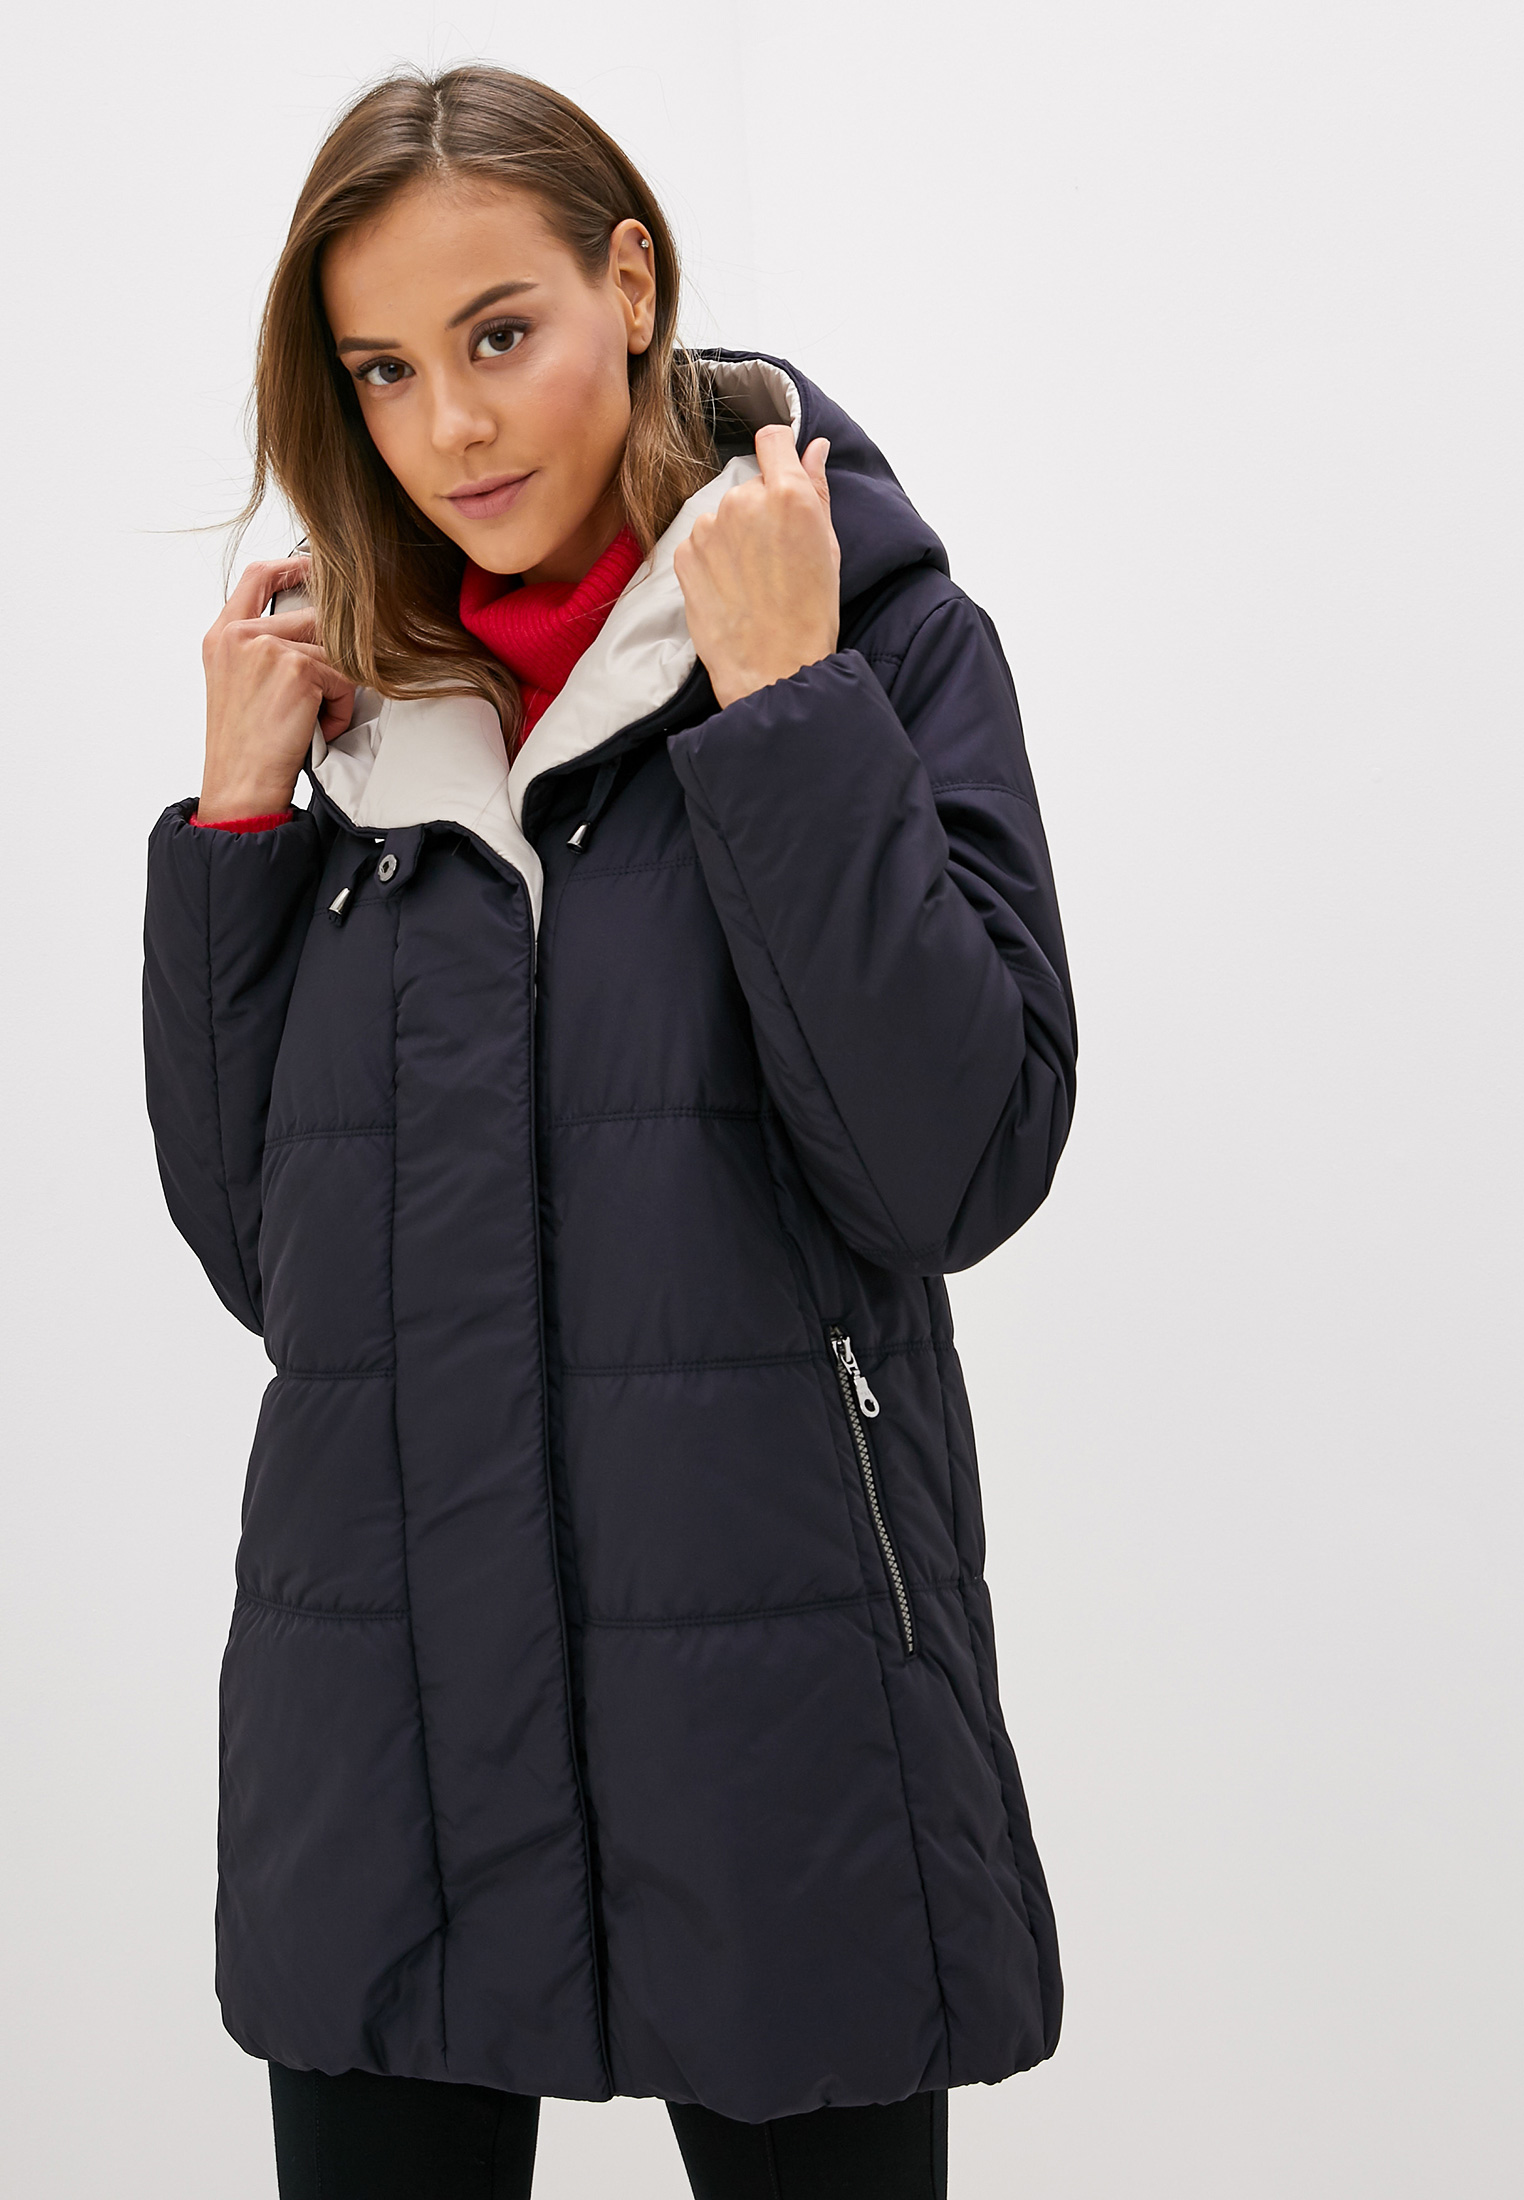 Куртка утепленная, Dixi-Coat, цвет: синий. Артикул: MP002XW152D1. Одежда / Верхняя одежда